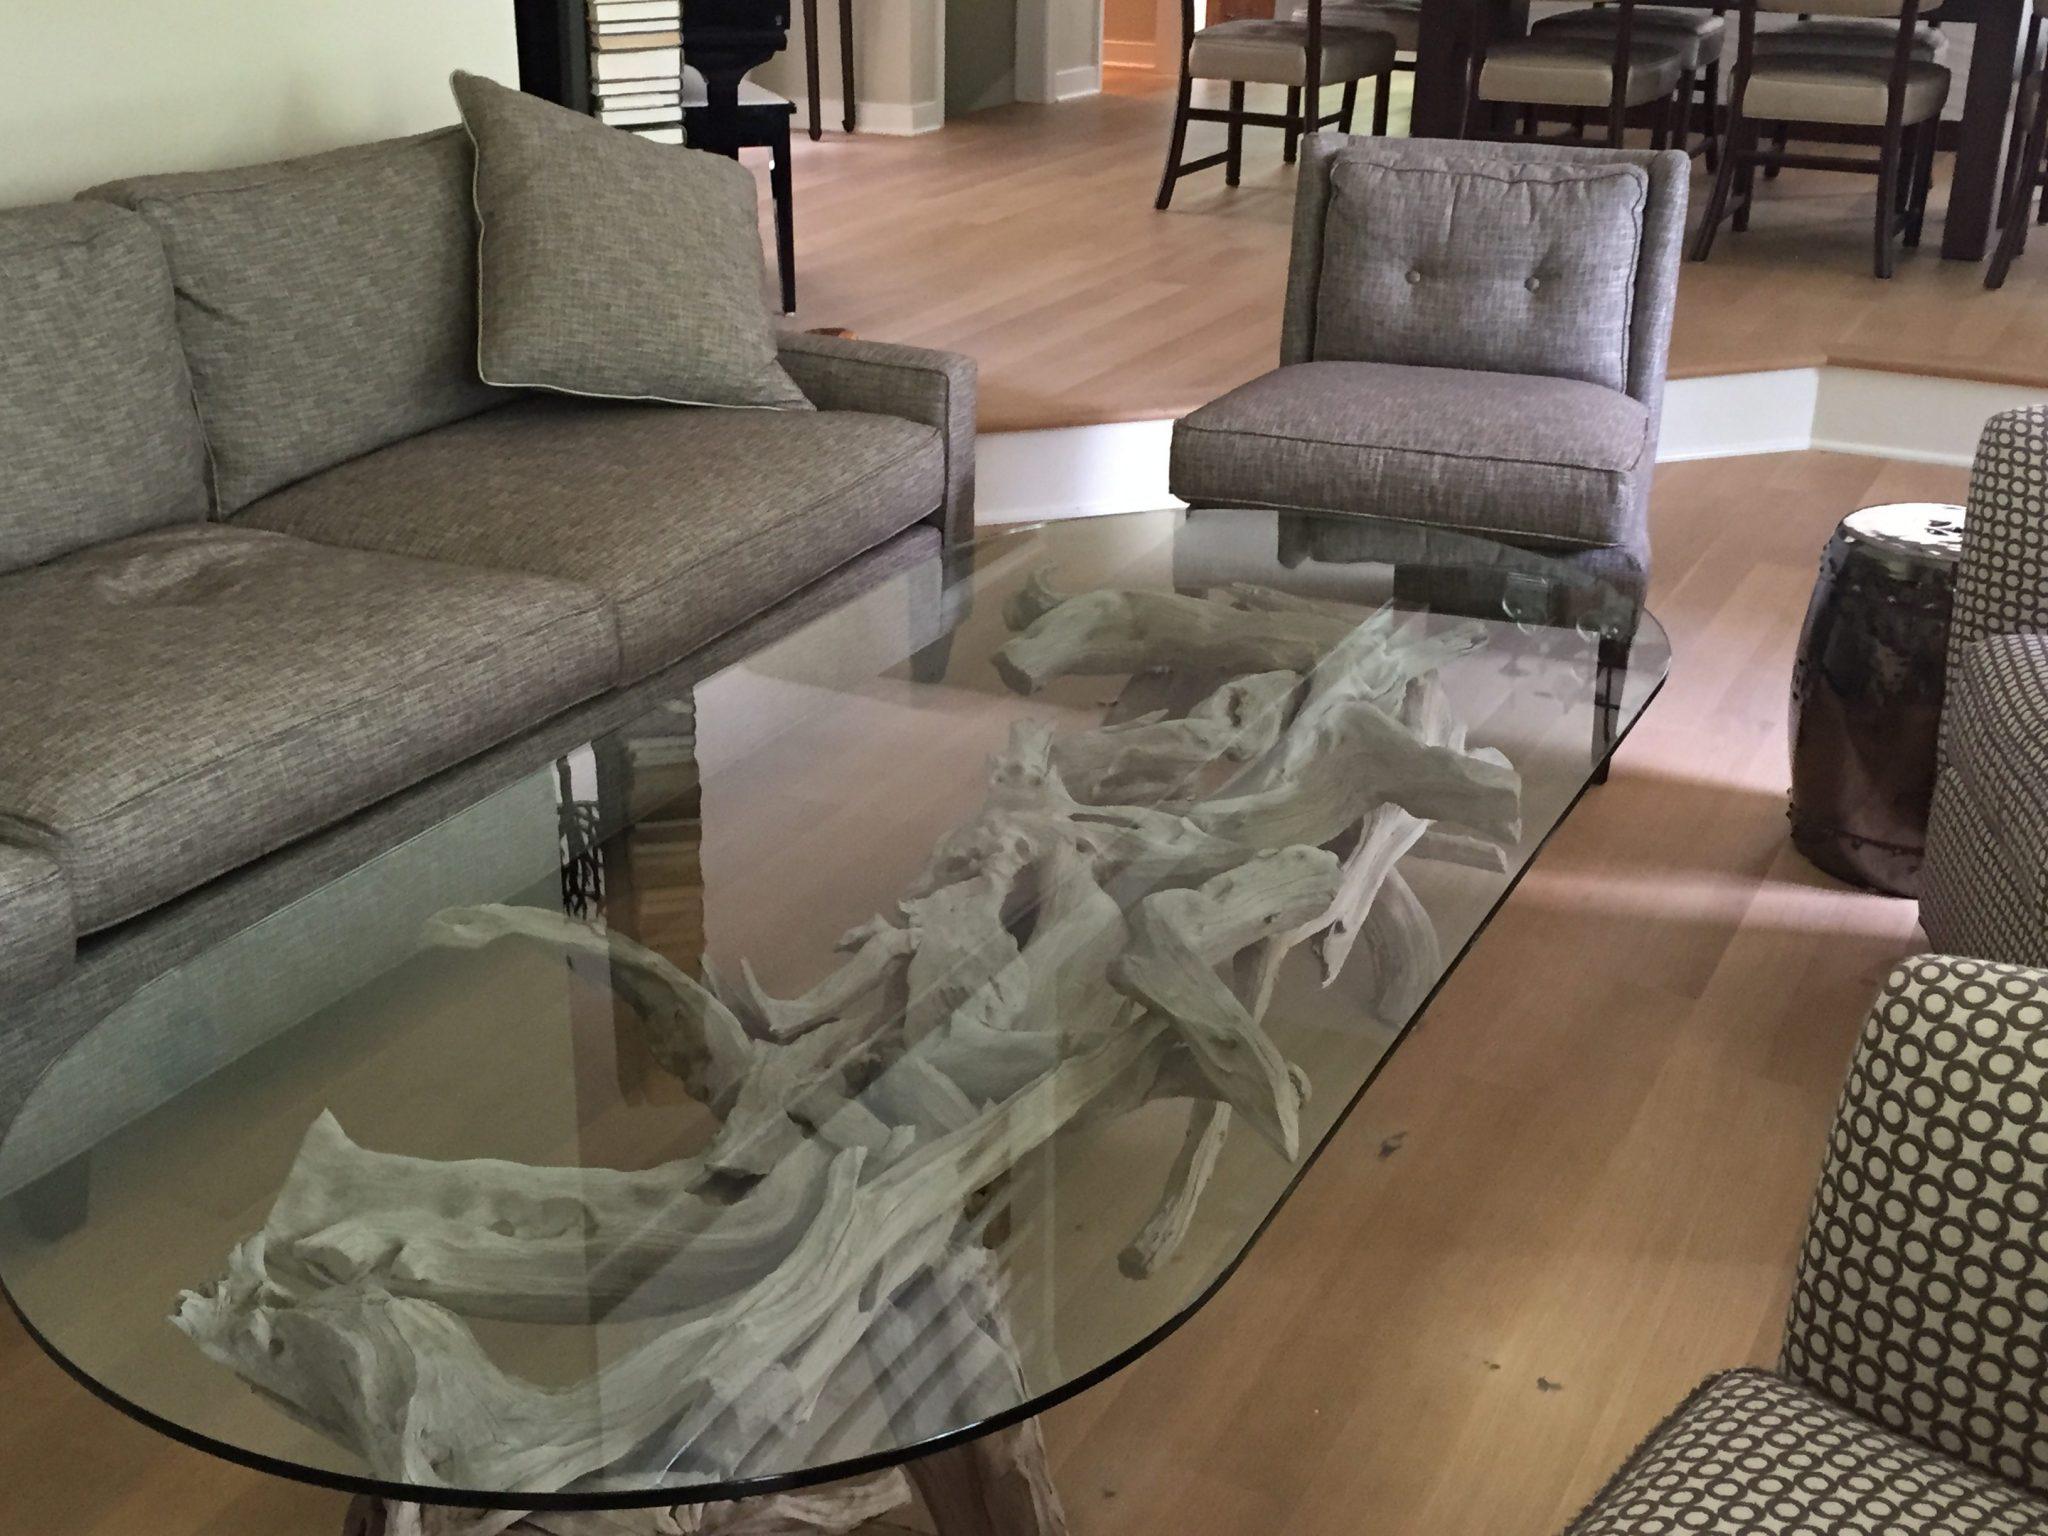 A very long faded sandblasted coffee table